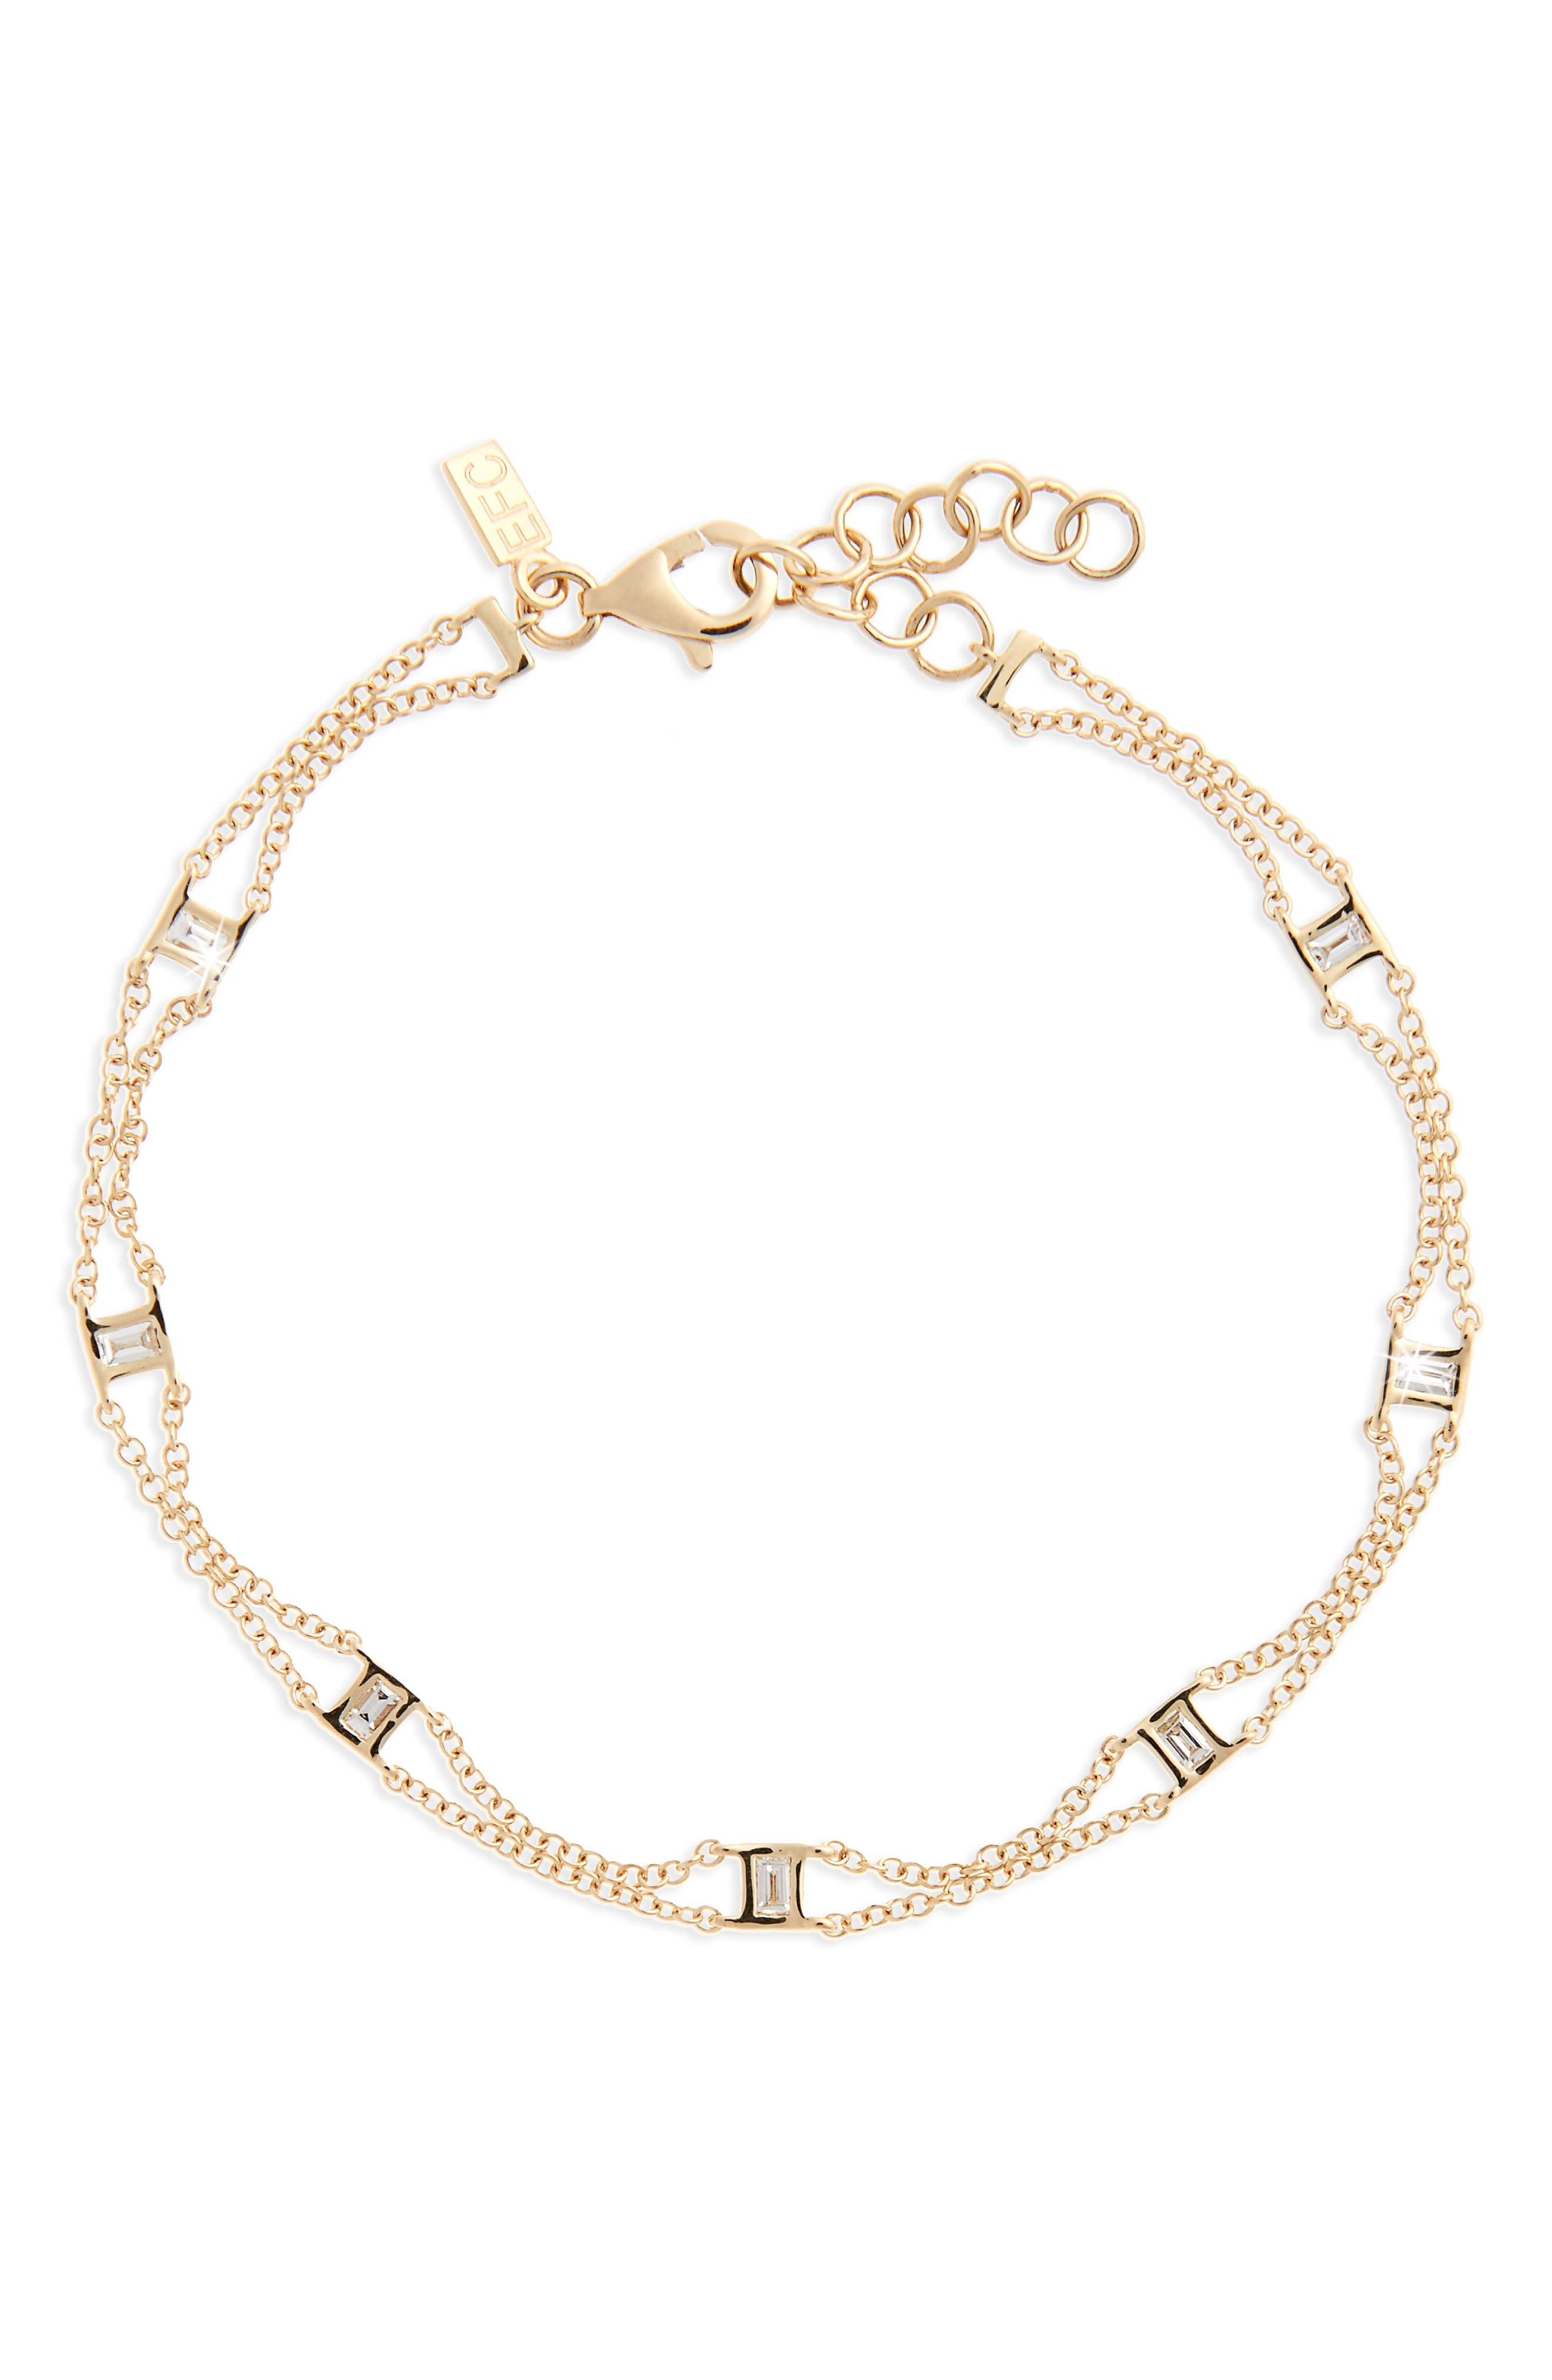 EF COLLECTION Lucky 7 Baguette Chain Diamond Bracelet